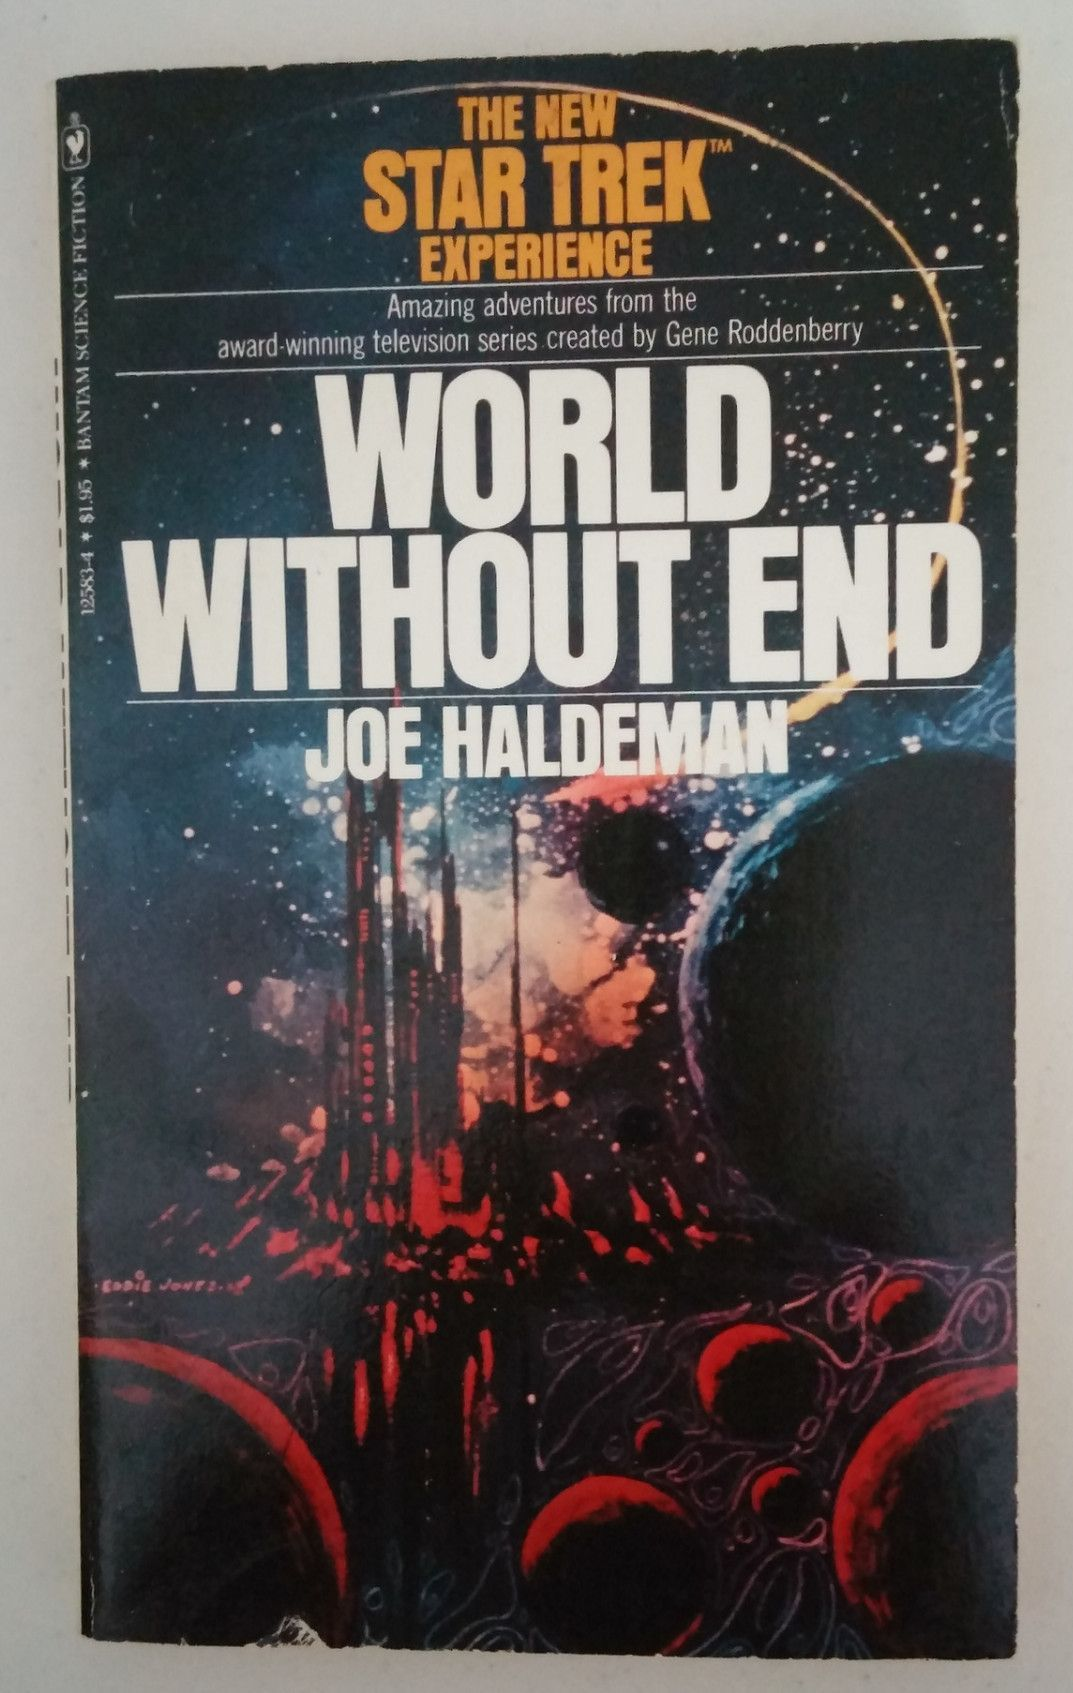 Star Trek: World Without End -- Joe Haldeman